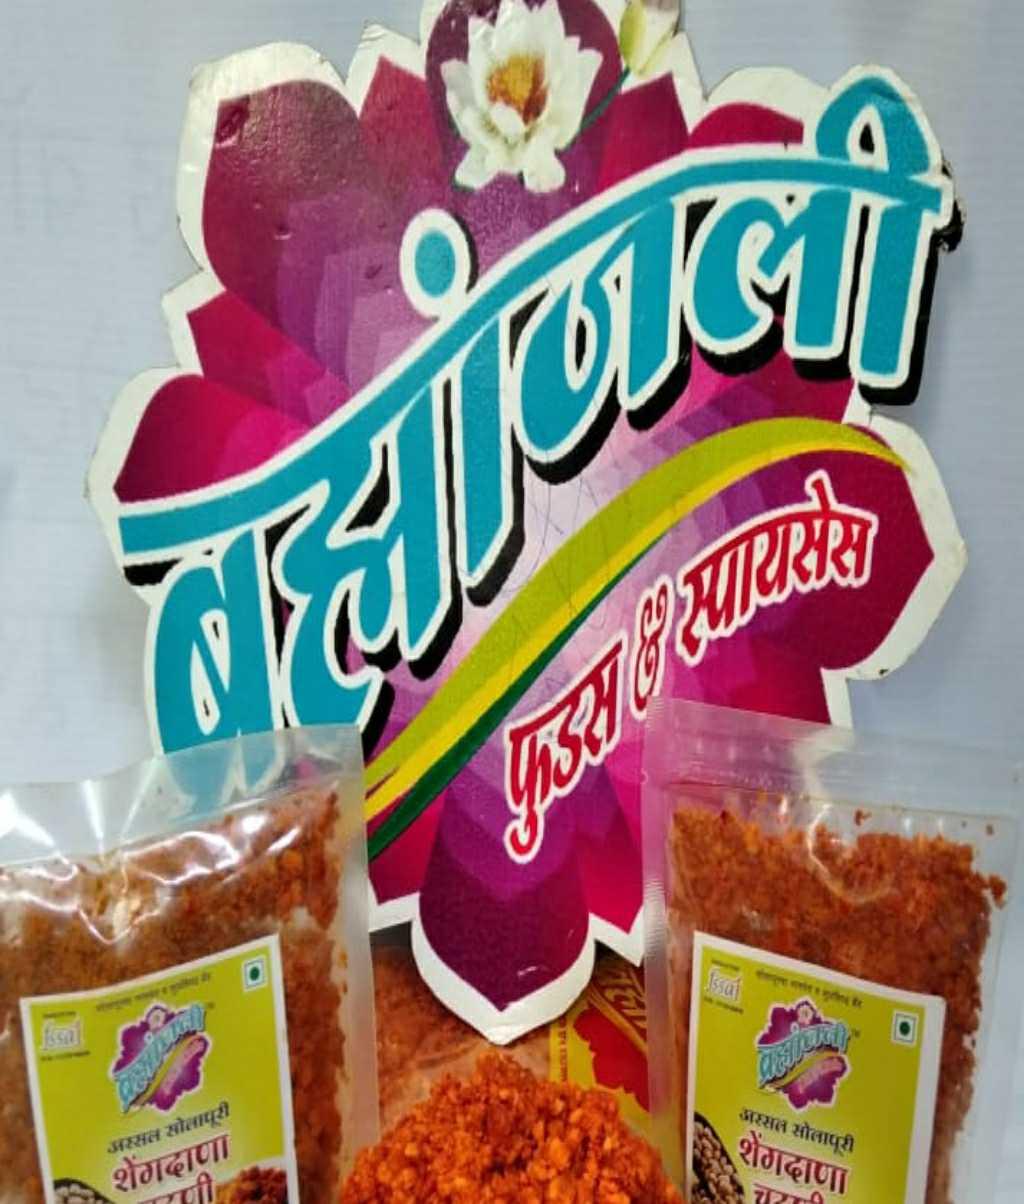 Bramhanjali Foods & Spices